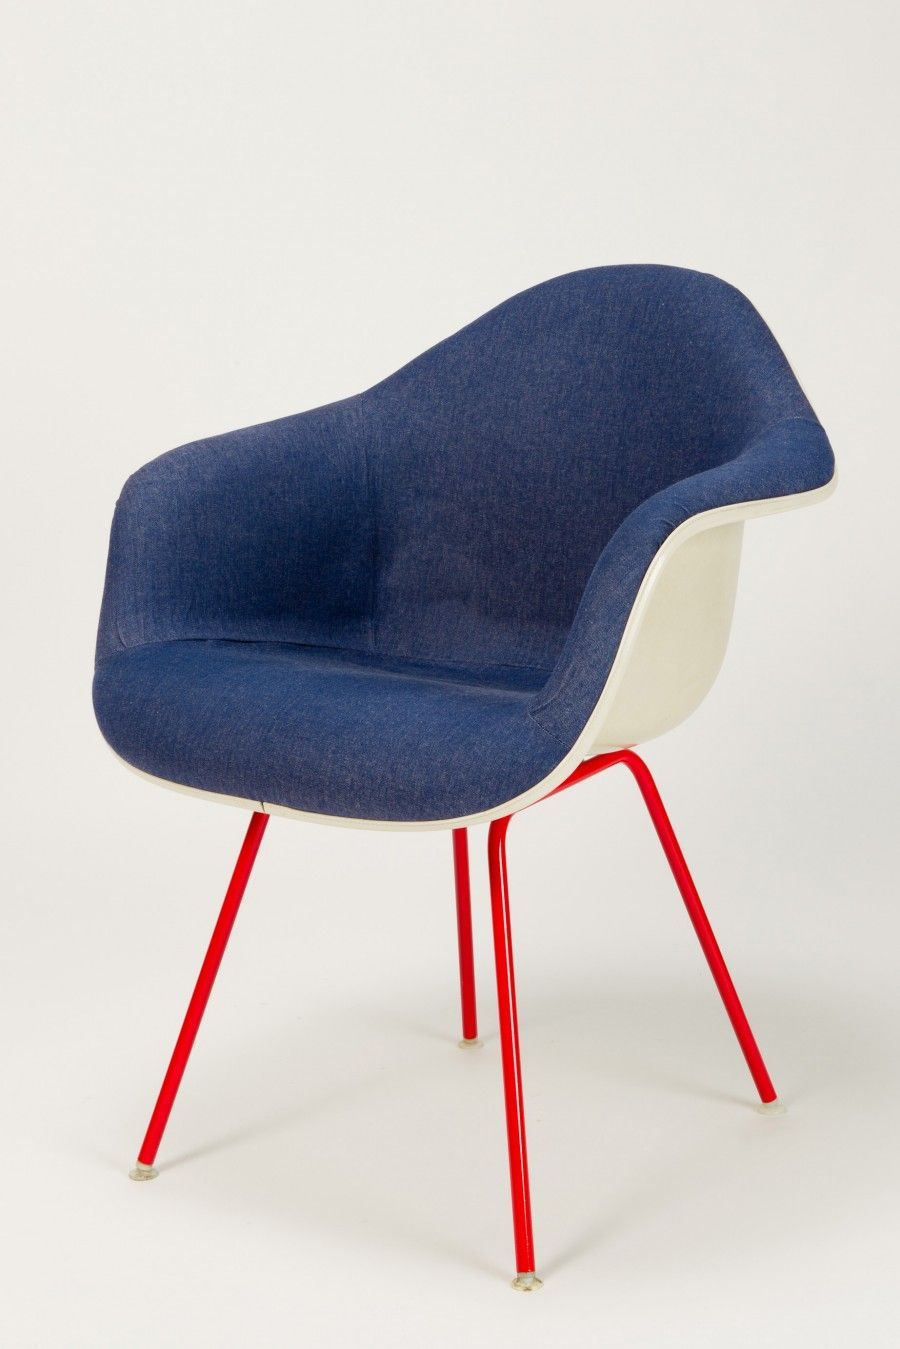 Vollbild Download   Moveis e Ambientes   Pinterest   Sessel und Möbel